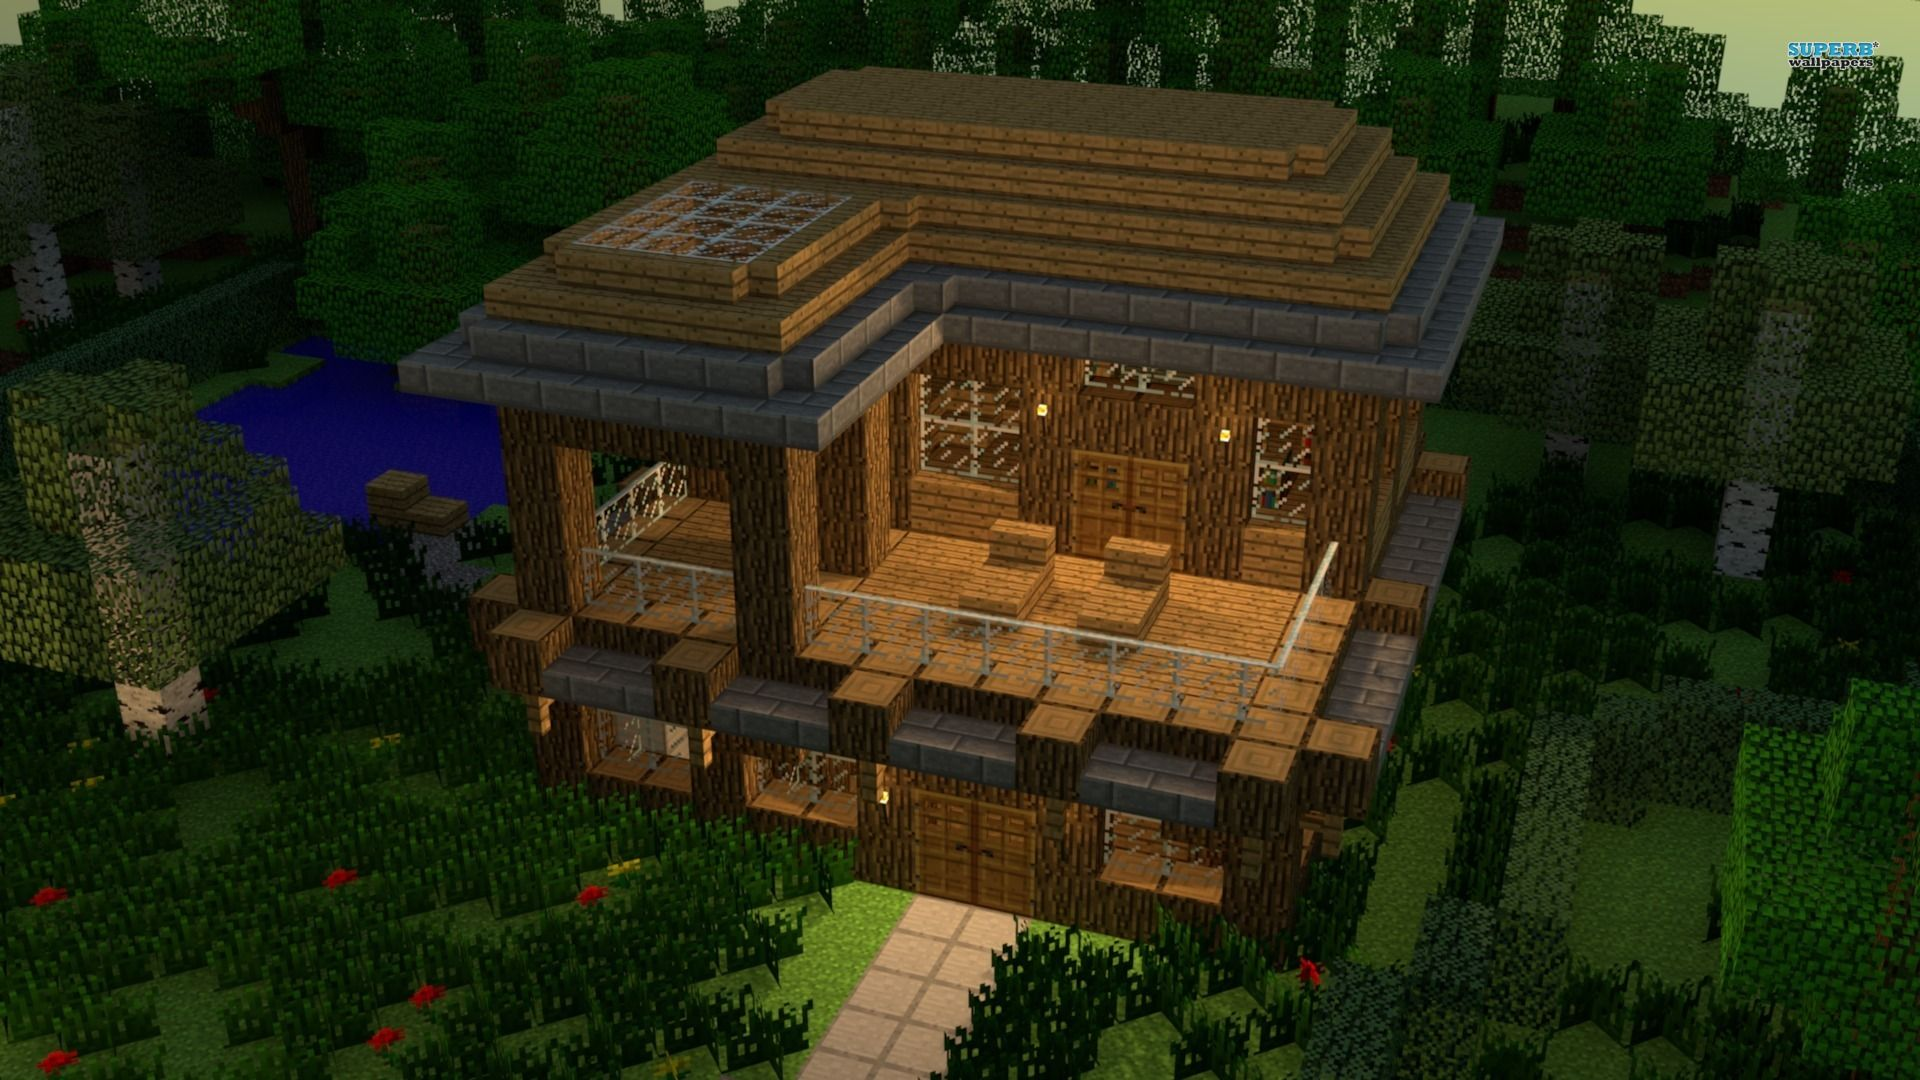 Cool Wallpaper Minecraft Gamer - 85a160a03727ddf677237bec94c22ba7  Image_486535.jpg